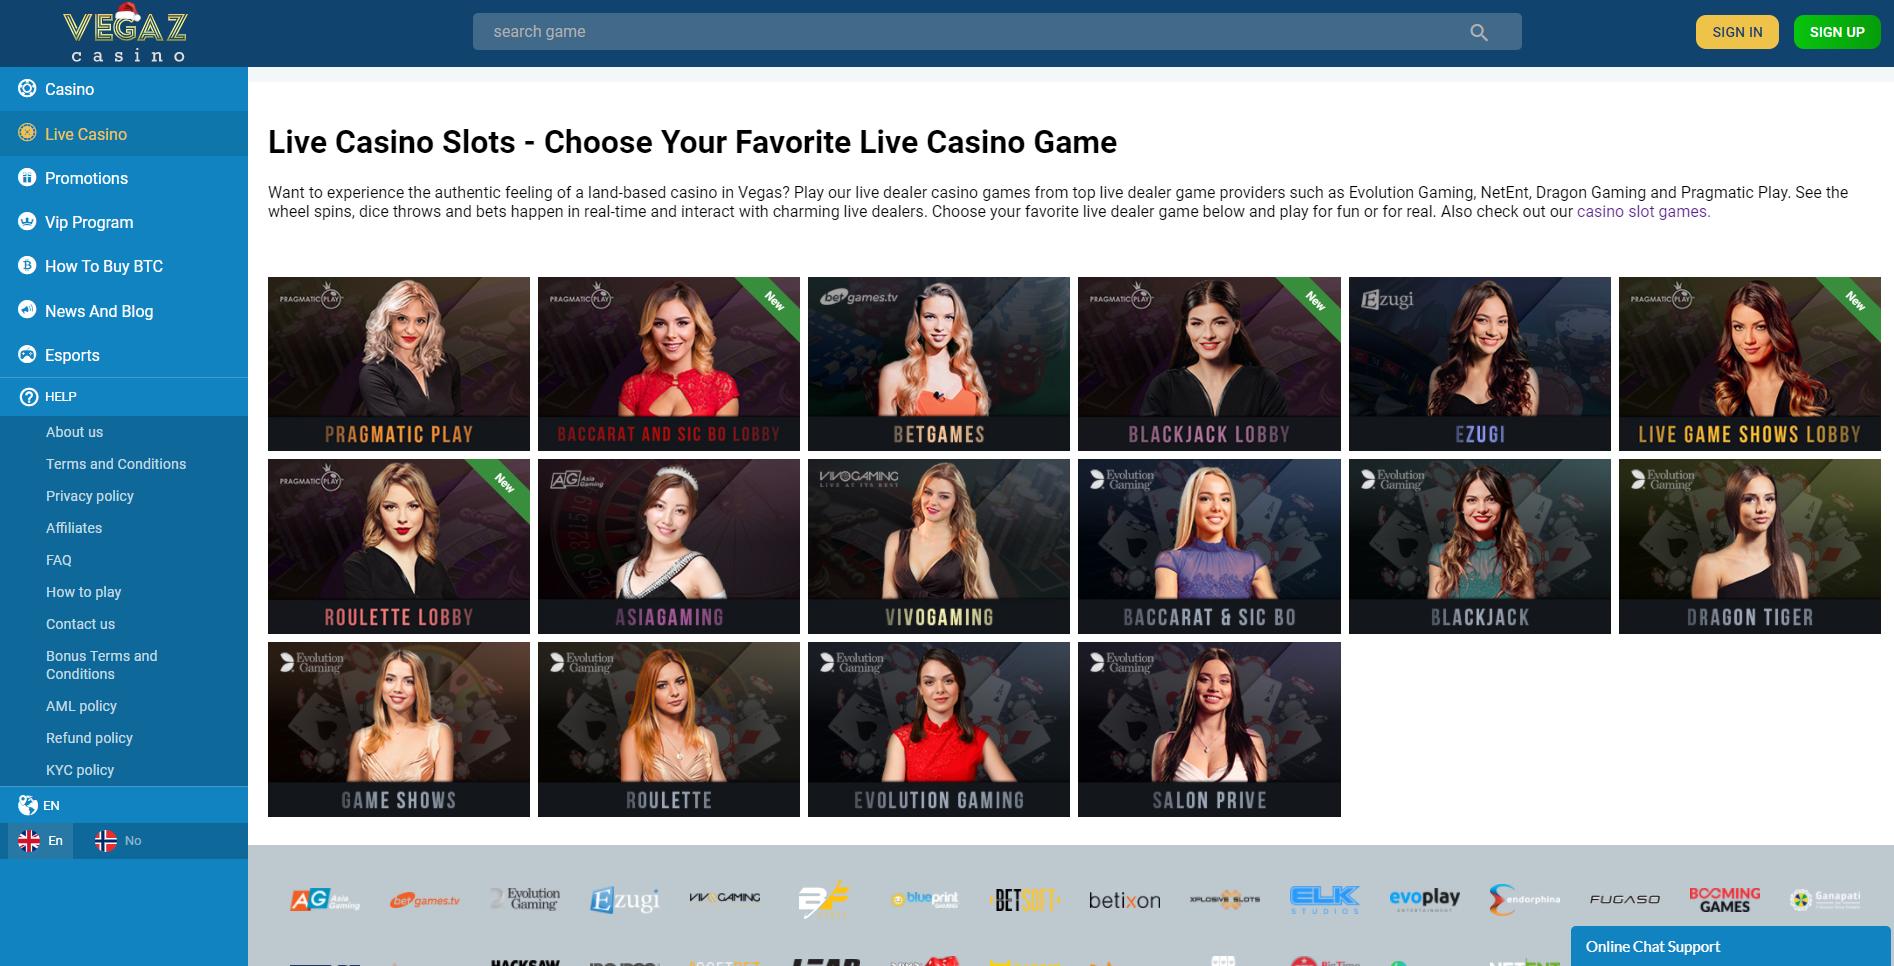 vegaz live kazino casino evolution gaming betgames.tv ezugi pragmatic play dalintojos ruletė blackjack